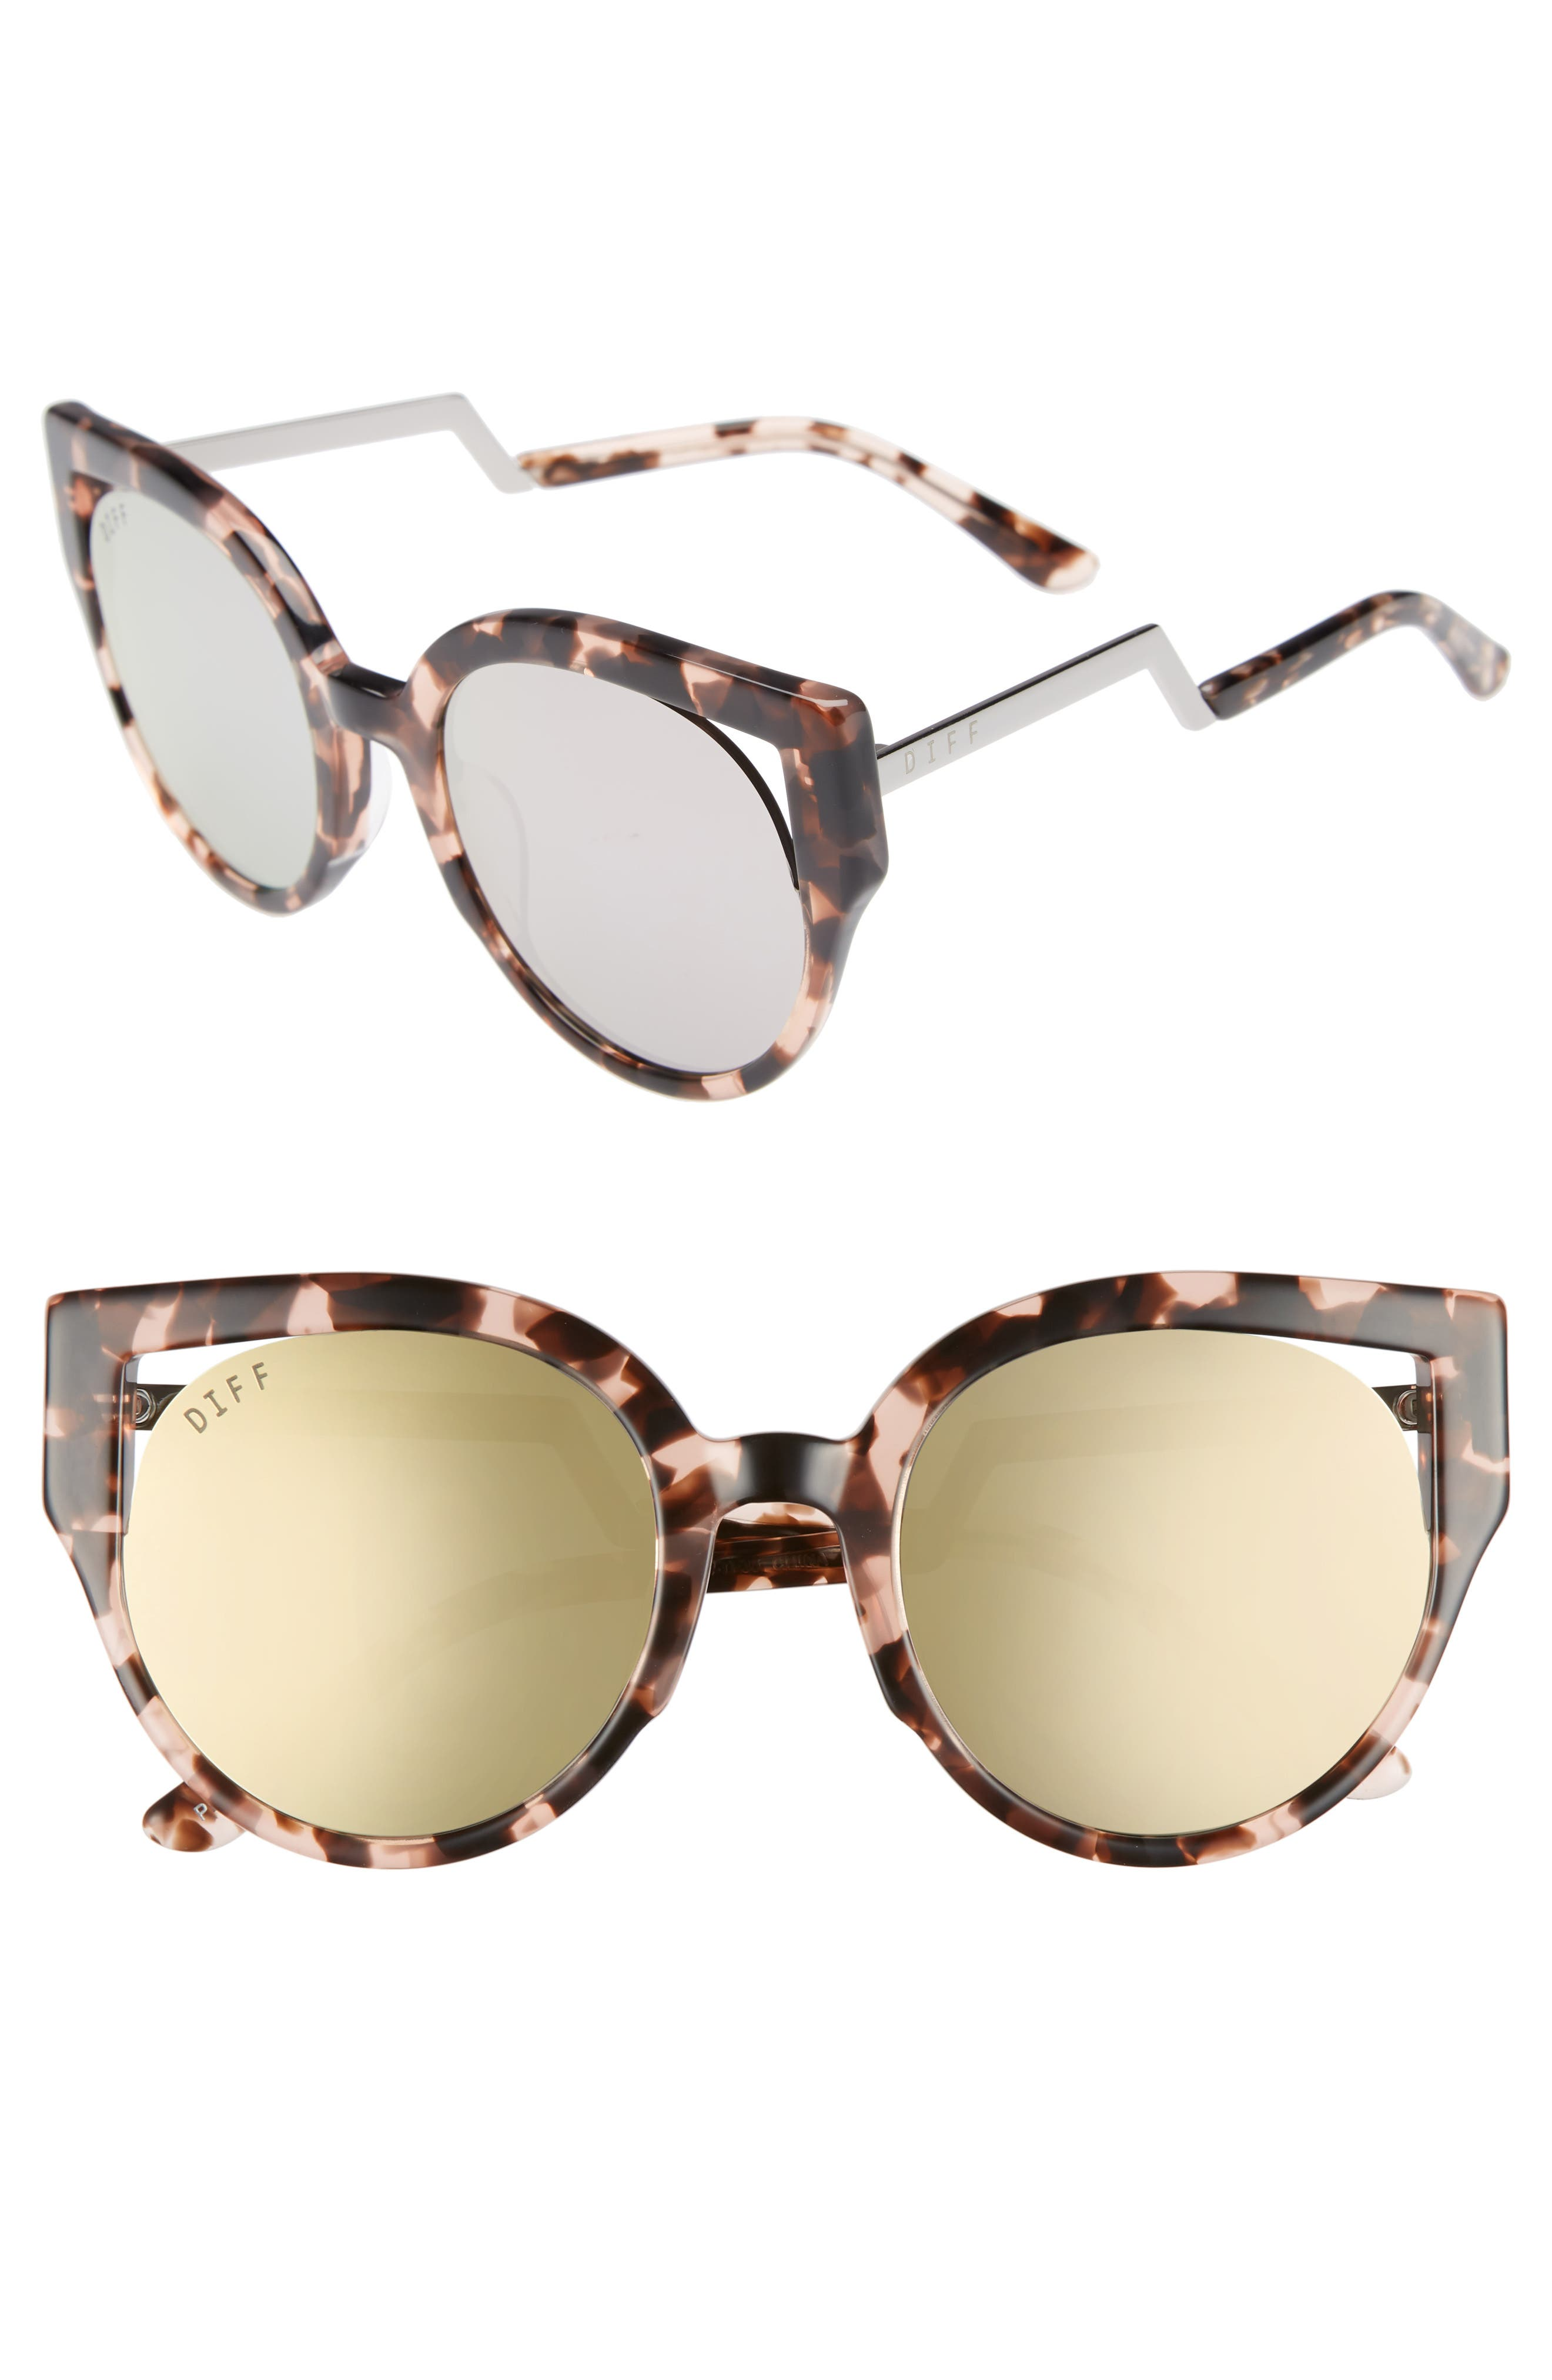 DIFF Penny 55mm Cat Eye Sunglasses